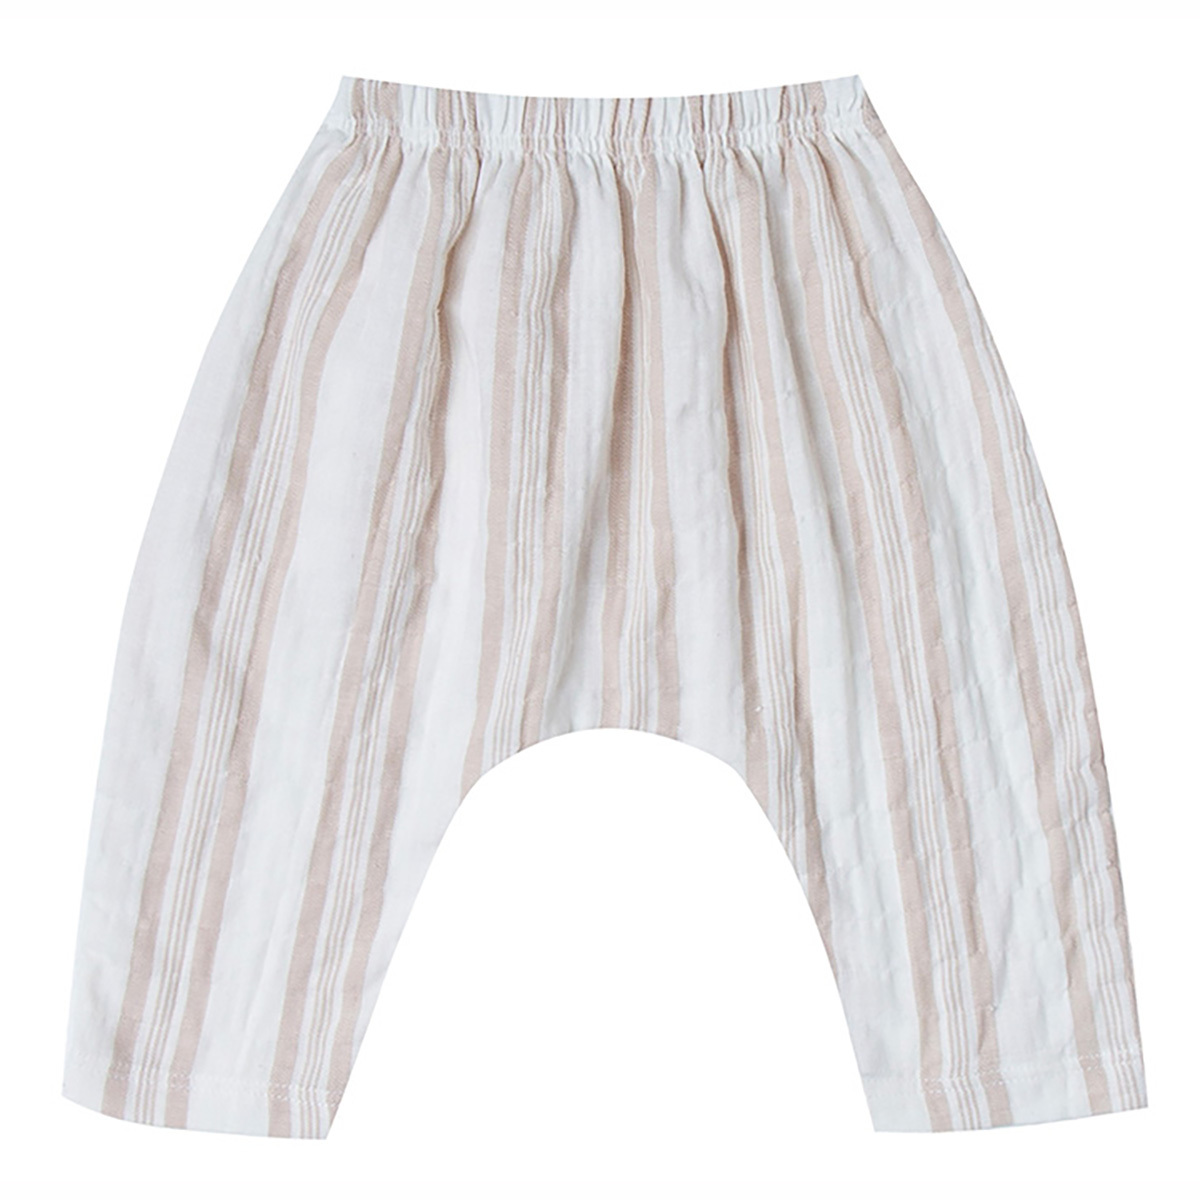 Bas bébé Pantalon à Rayures - Sand - 12/18 Mois